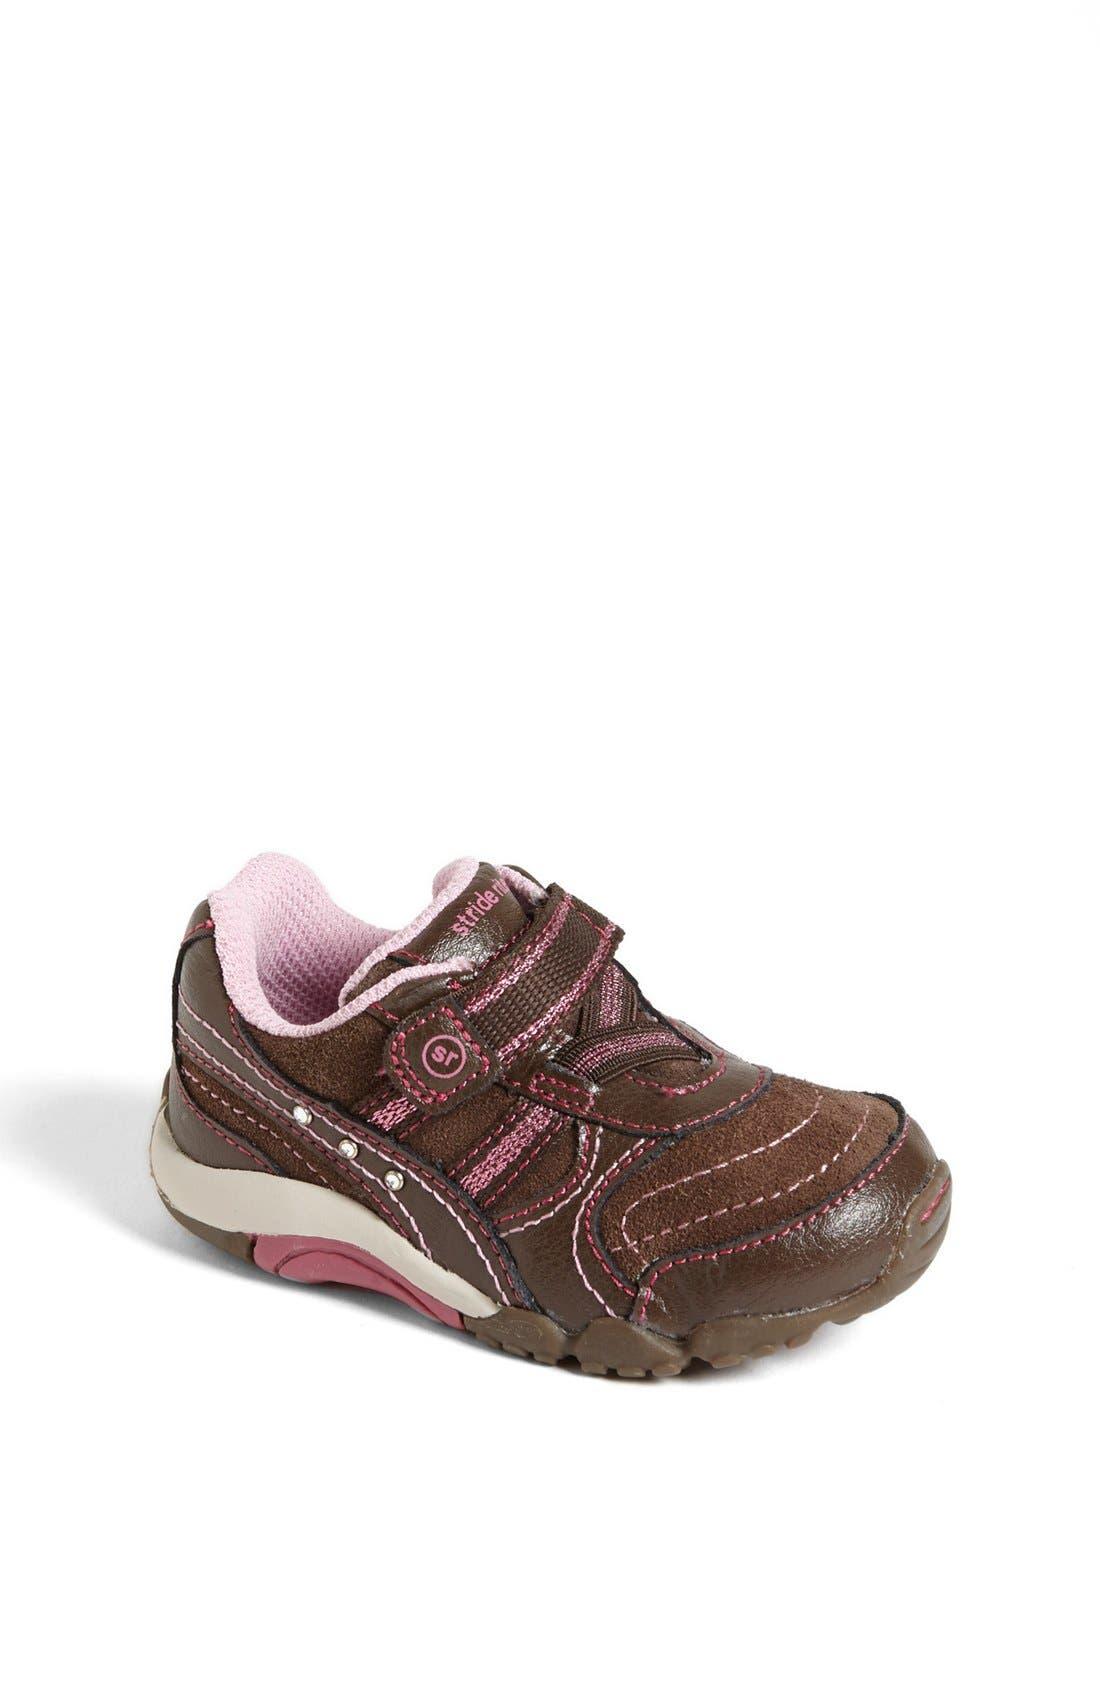 Main Image - Stride Rite 'Lydia' Sneaker (Baby, Walker & Toddler)